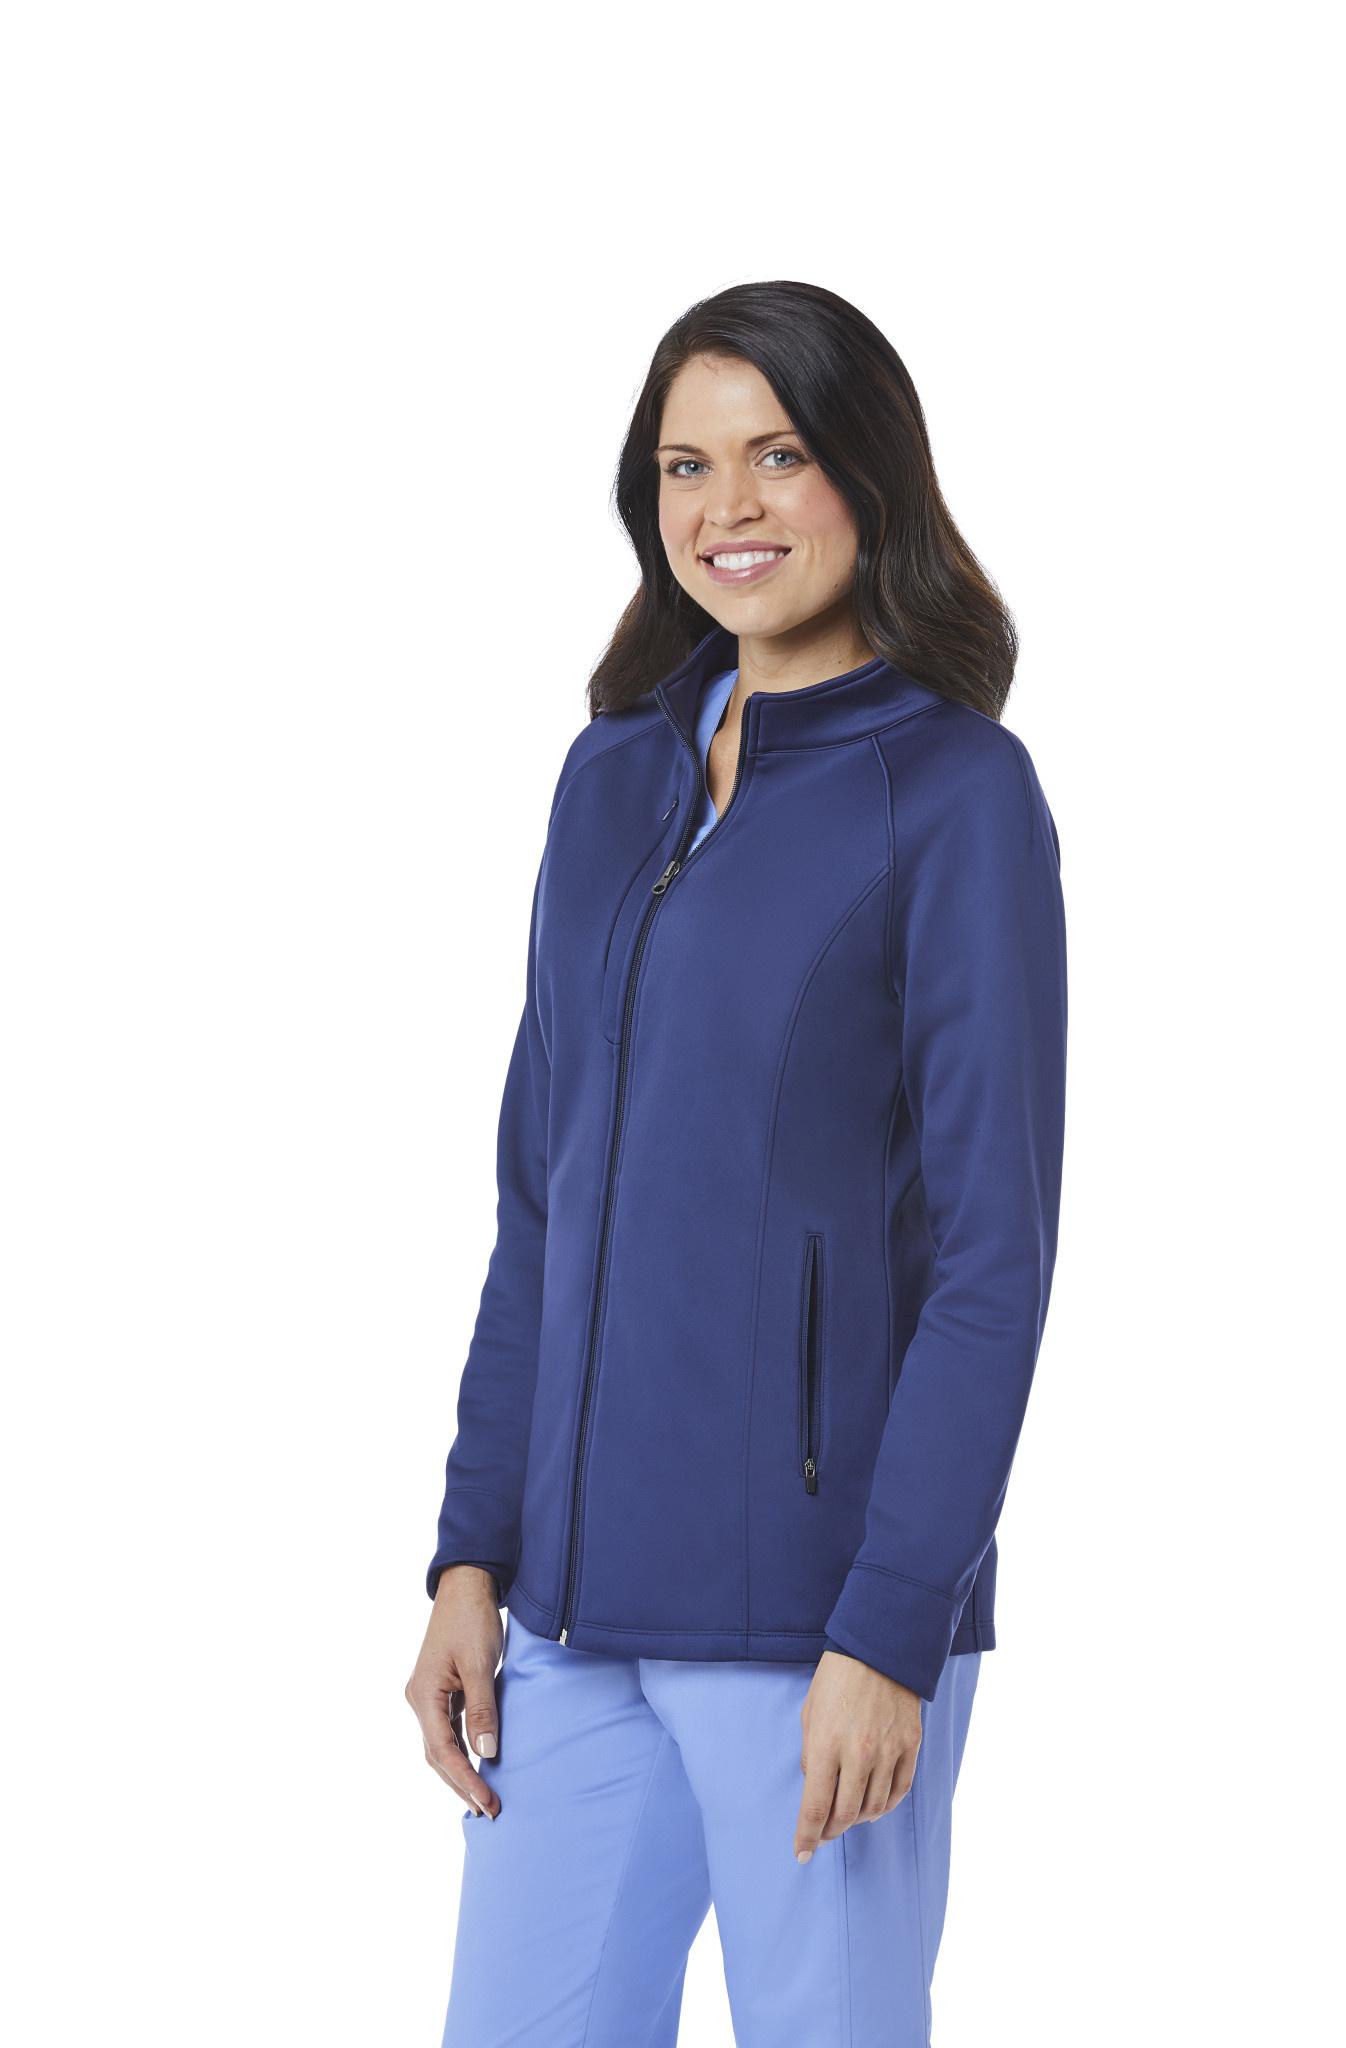 BLAZE Navy Blue Blaze Women's Warm Up Jackets 3812